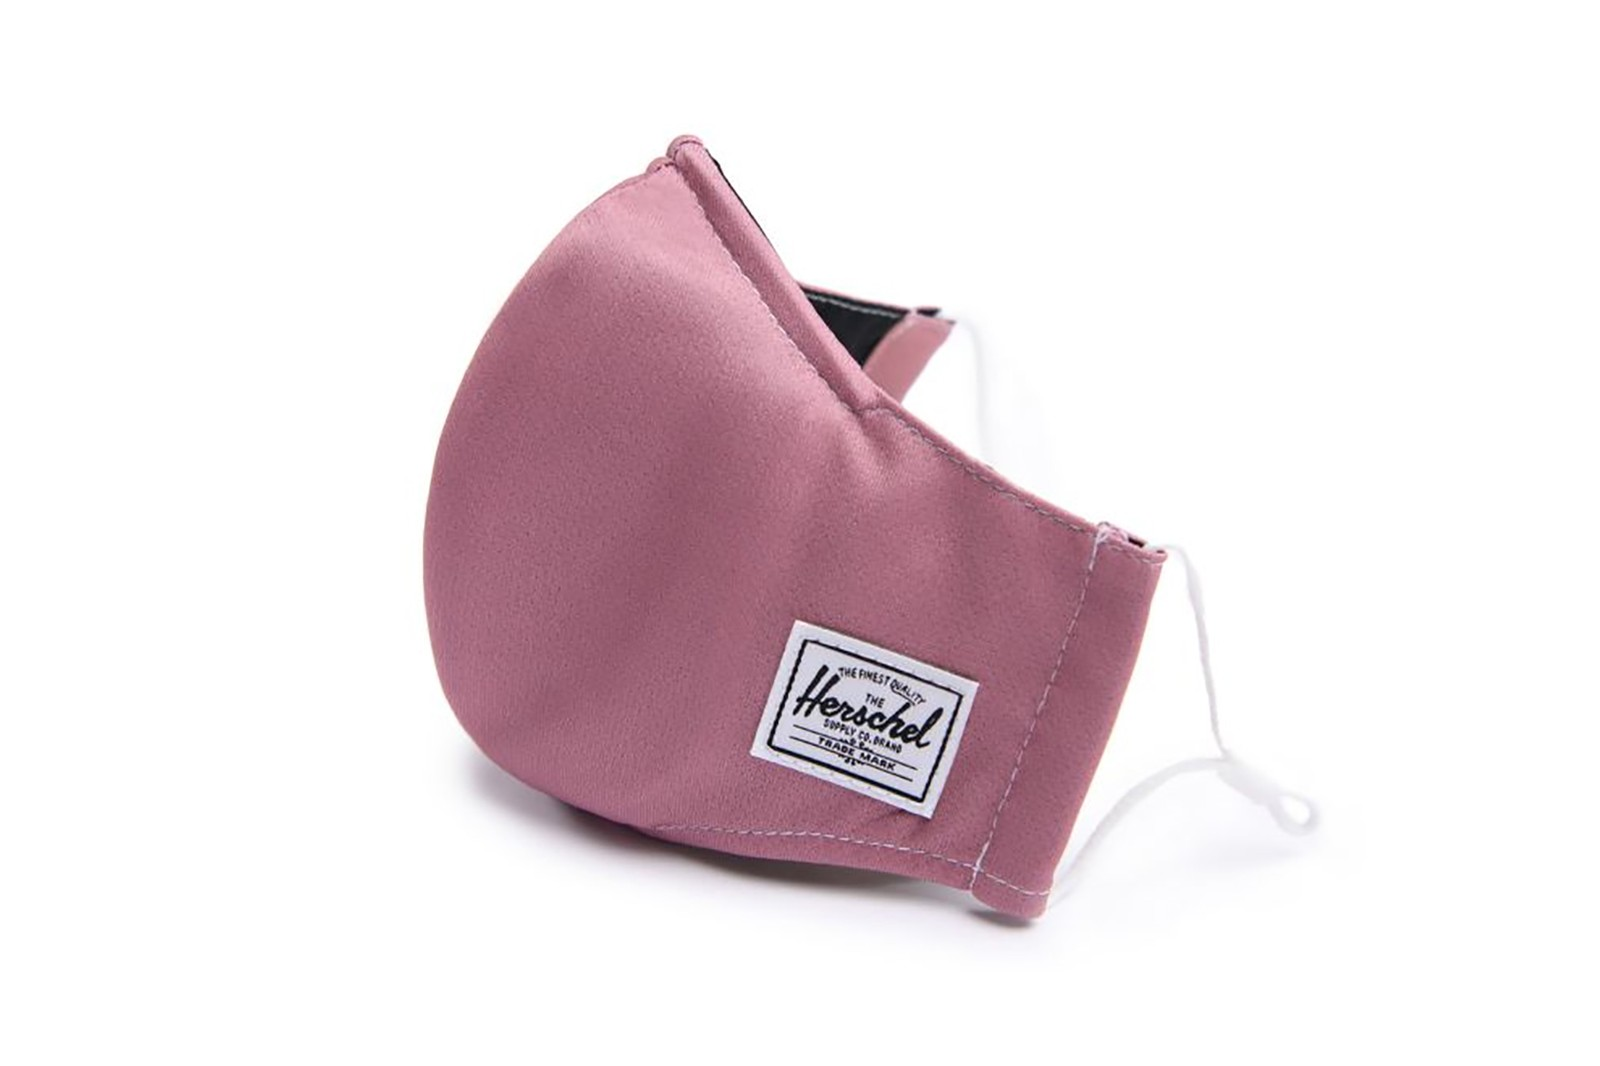 best face masks reusable washable sustainable uniqlo airism burberry vintage check cotton